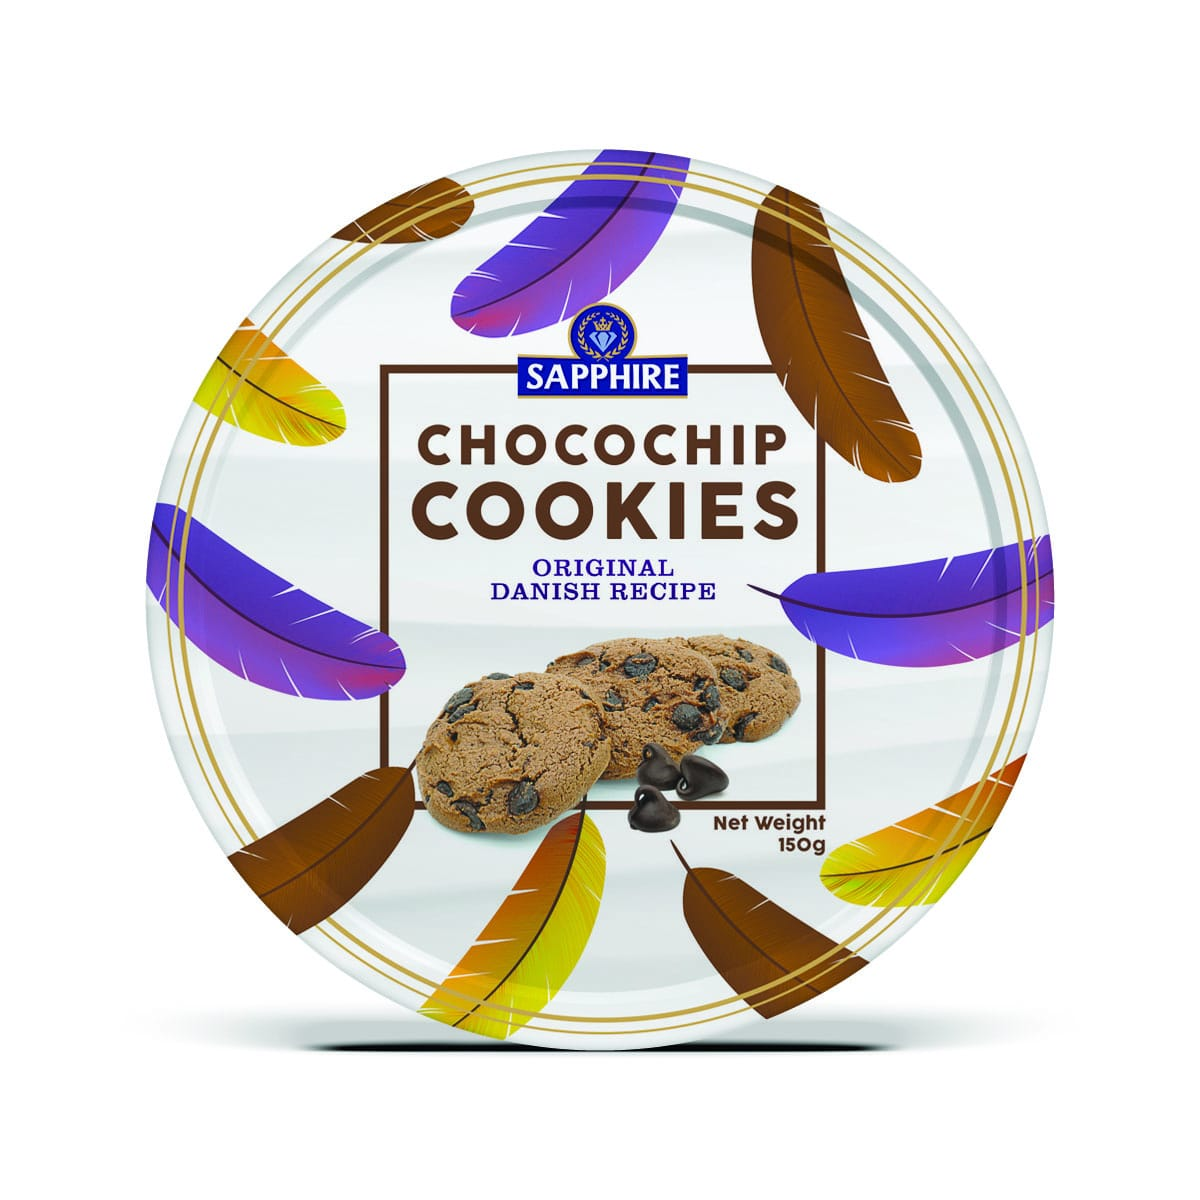 Sapphire Chocochip Cookies 150g